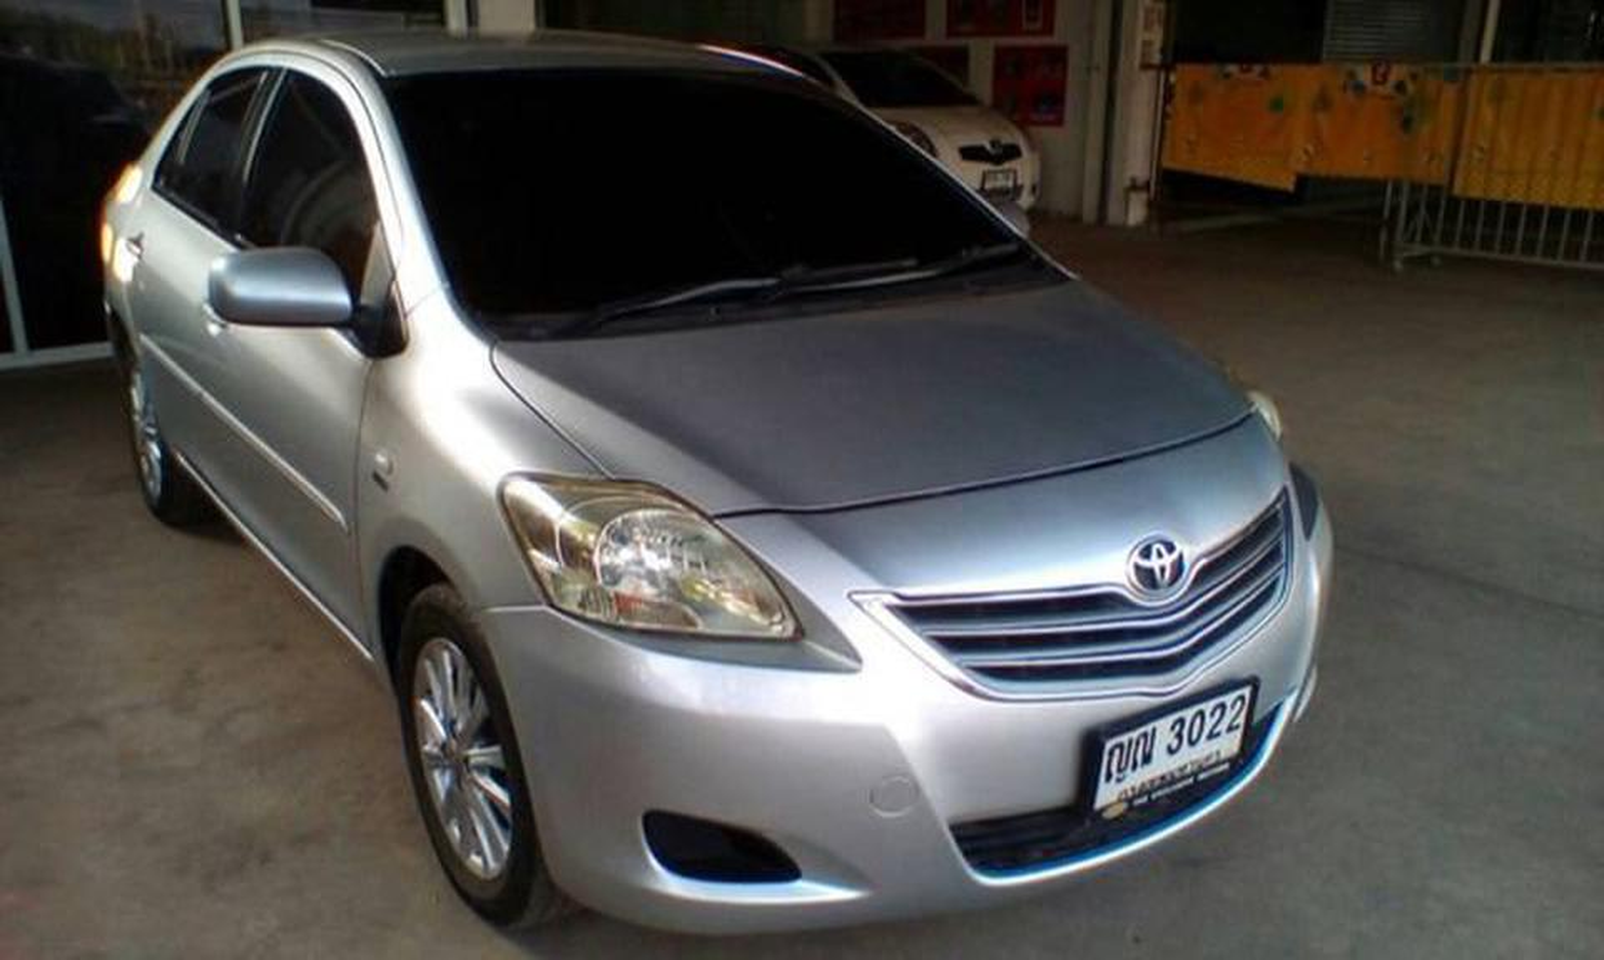 Toyota vios 1.5 Ev ปี2011 รถสวย นางฟ้า มีของแถม รูปที่ 1